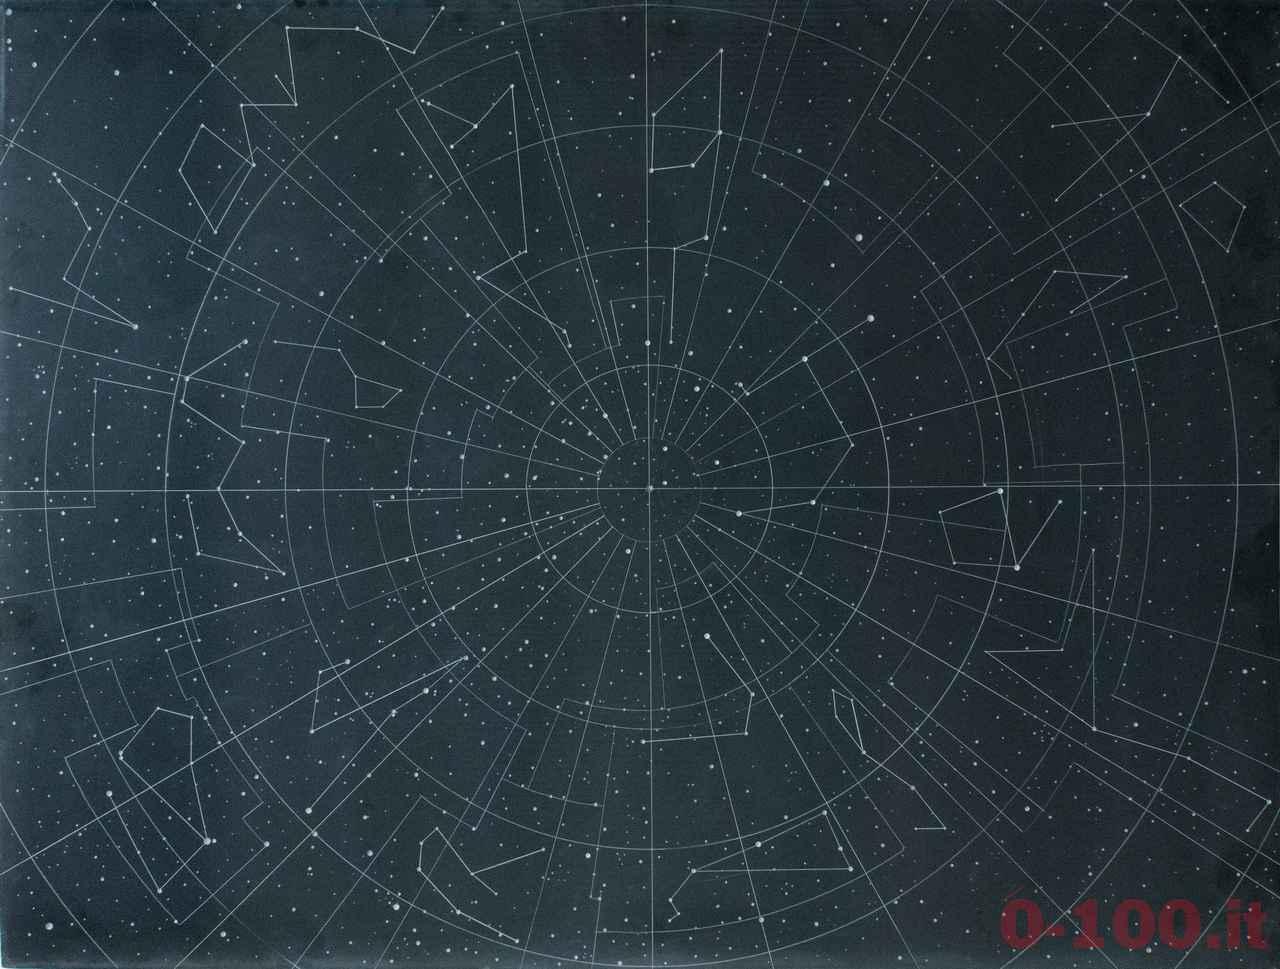 Contexto 2016- Dario Goldaniga, Mappe stellari, 2015 - incisioni su lavagna_0-100